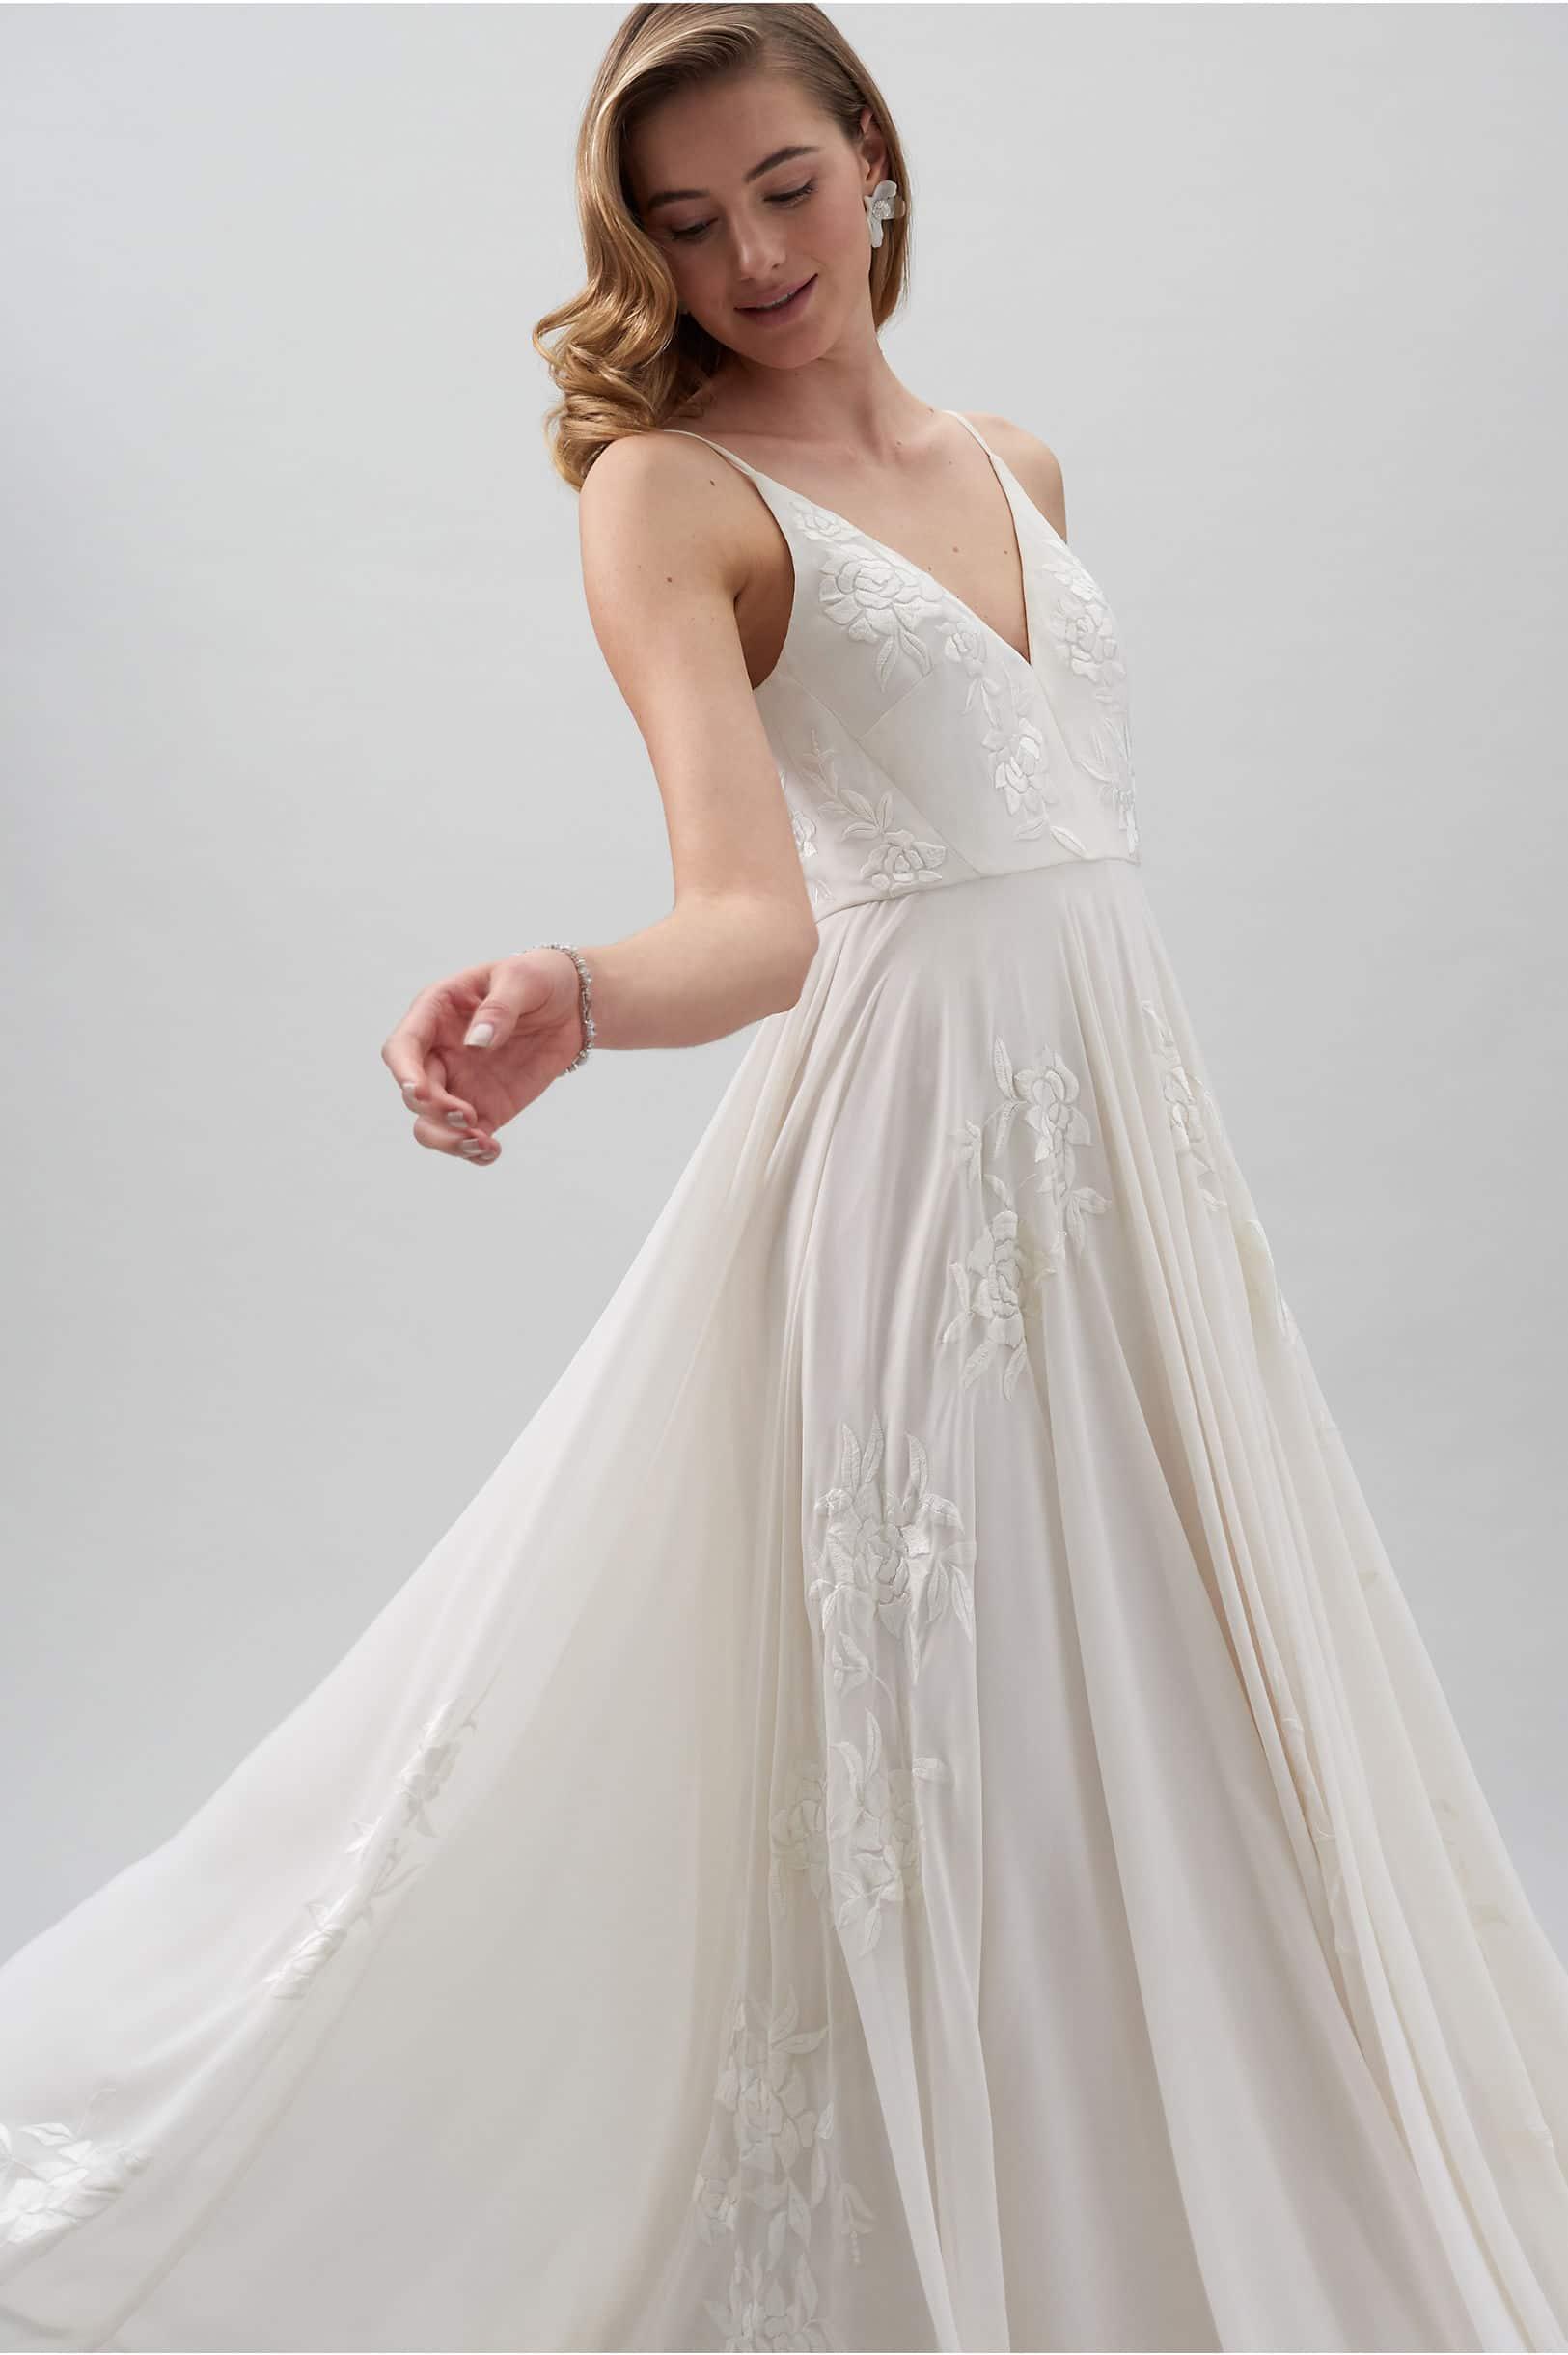 10 Best Elopement Wedding Dress Styles The Fo